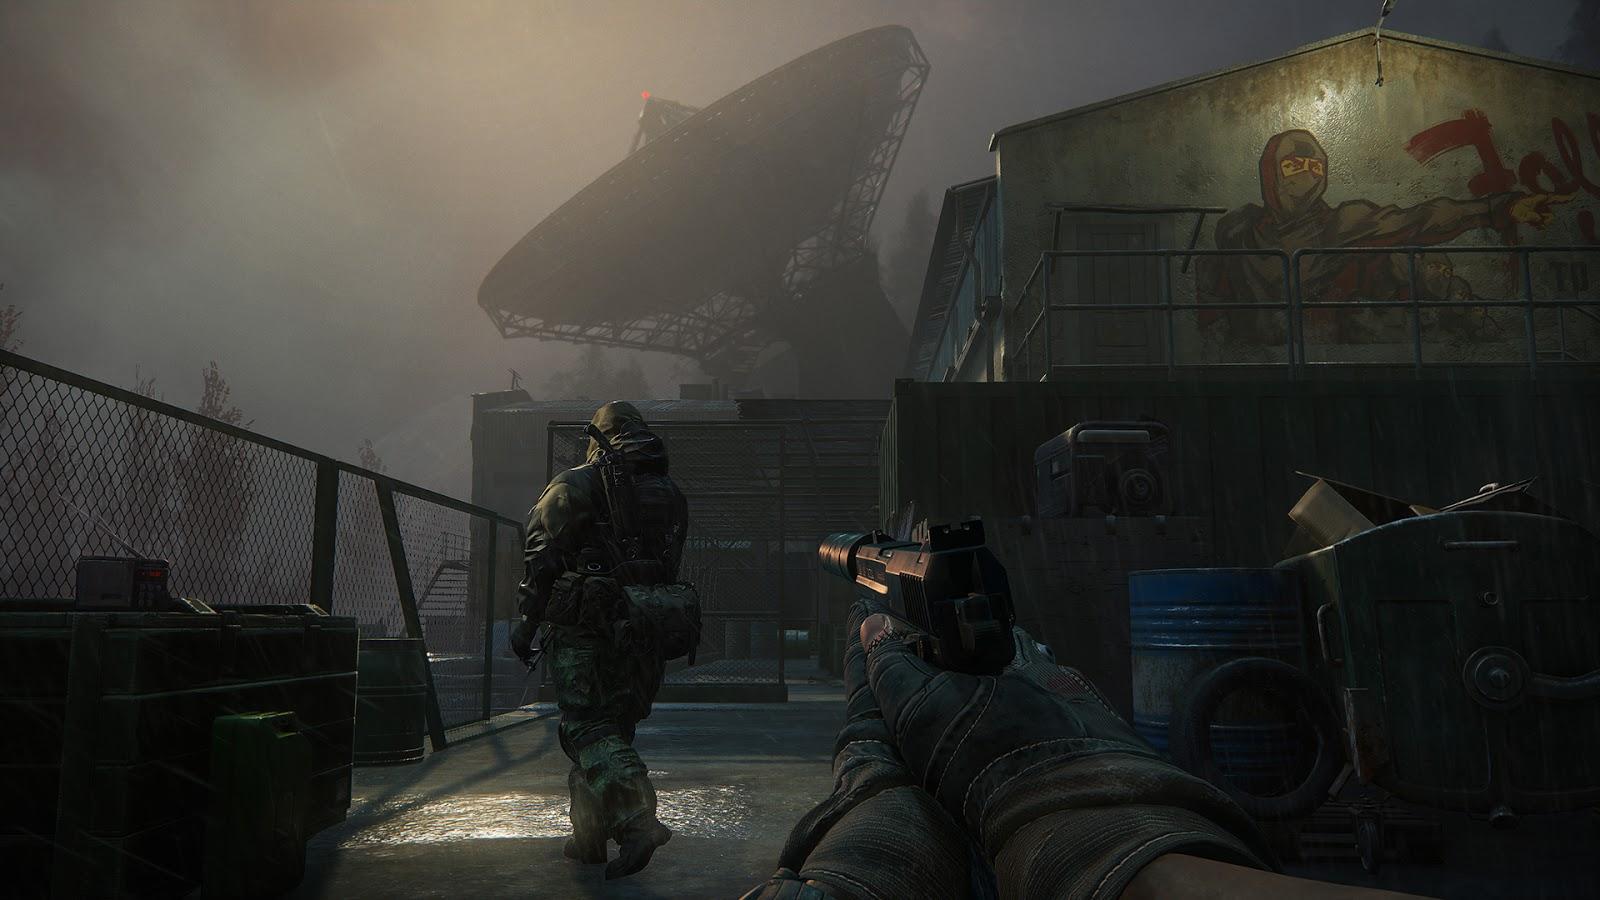 Sniper Ghost Warrior 3 ESPAÑOL PC (CPY) + Update v1.08 (PLAZA) + REPACK 10 DVD5 (JPW) 6